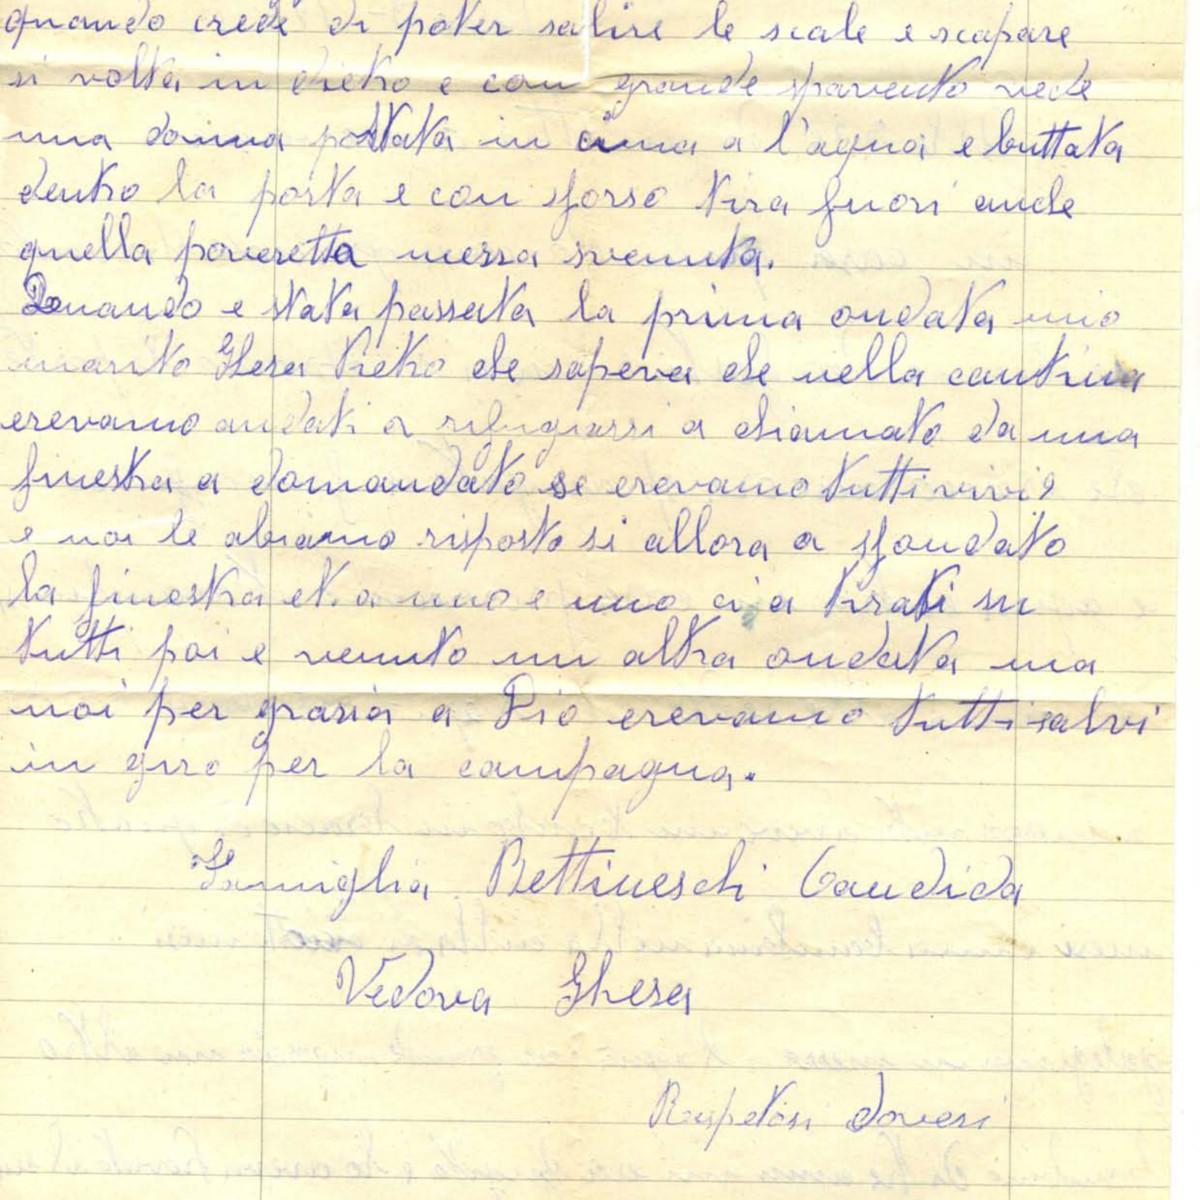 Lettera di Bettineschi Candida_02